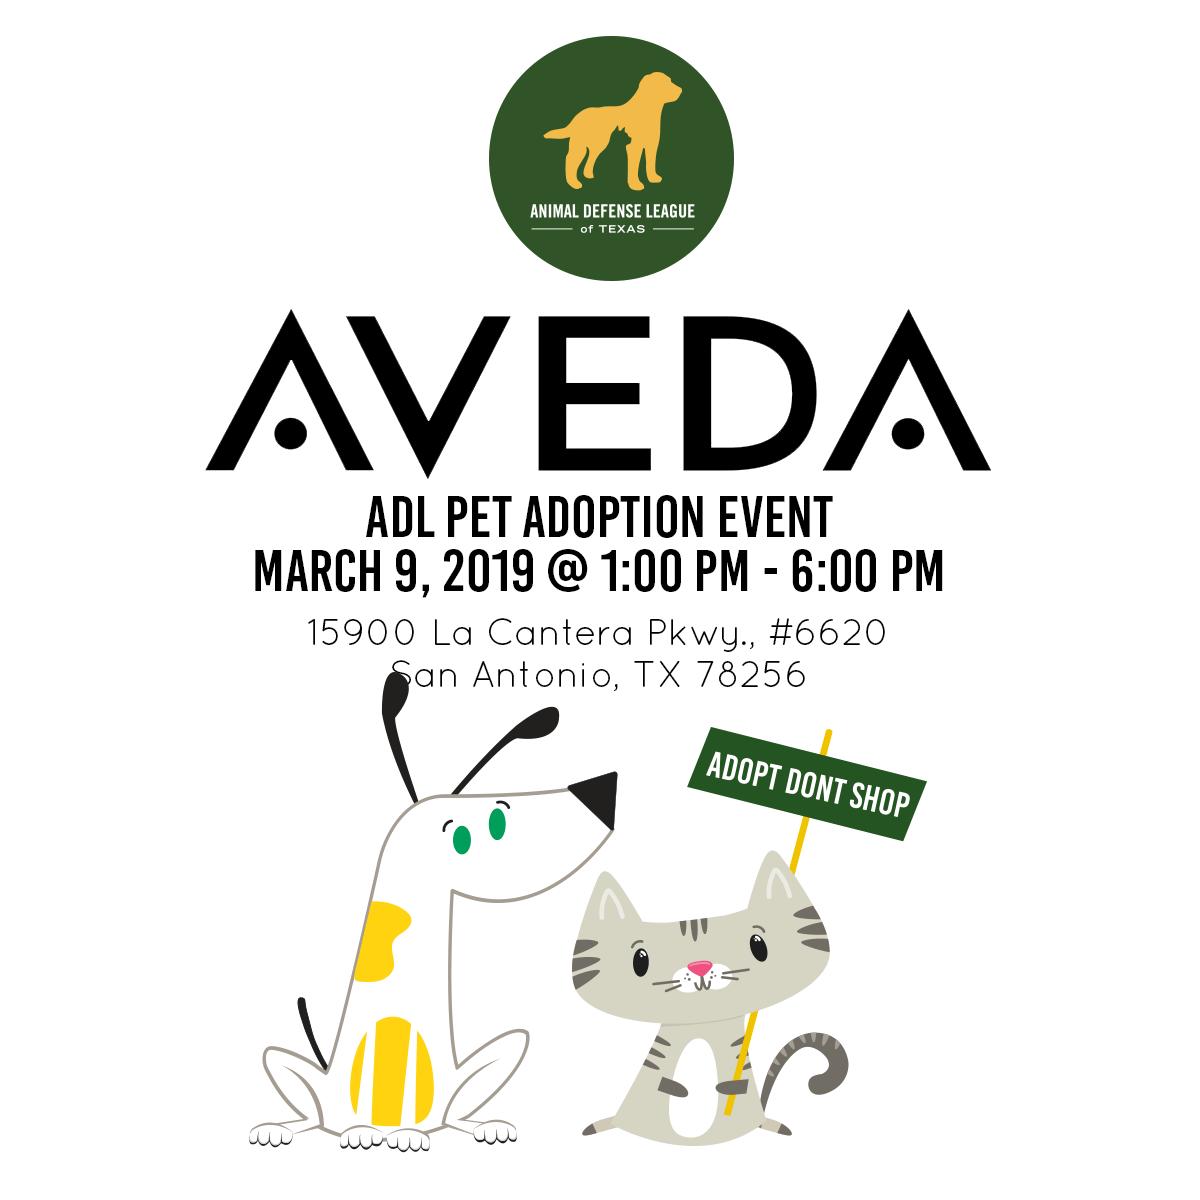 Aveda La Cantera Adl Adoption Event Animal Defense League Of Texas San Antonio Animal Defense League Of Texas San Antonio